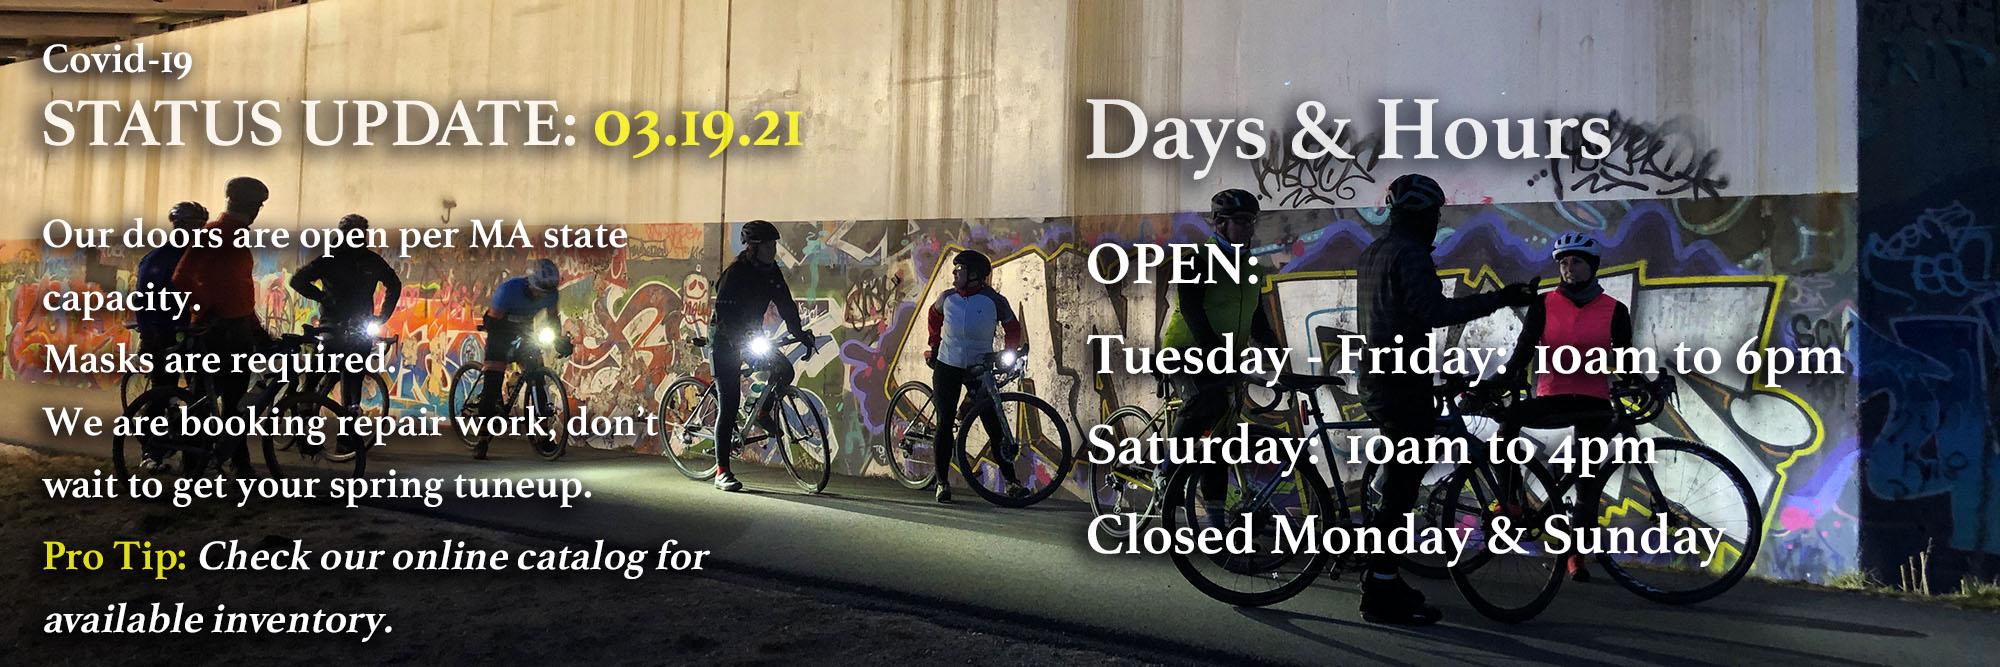 Bikework Hours